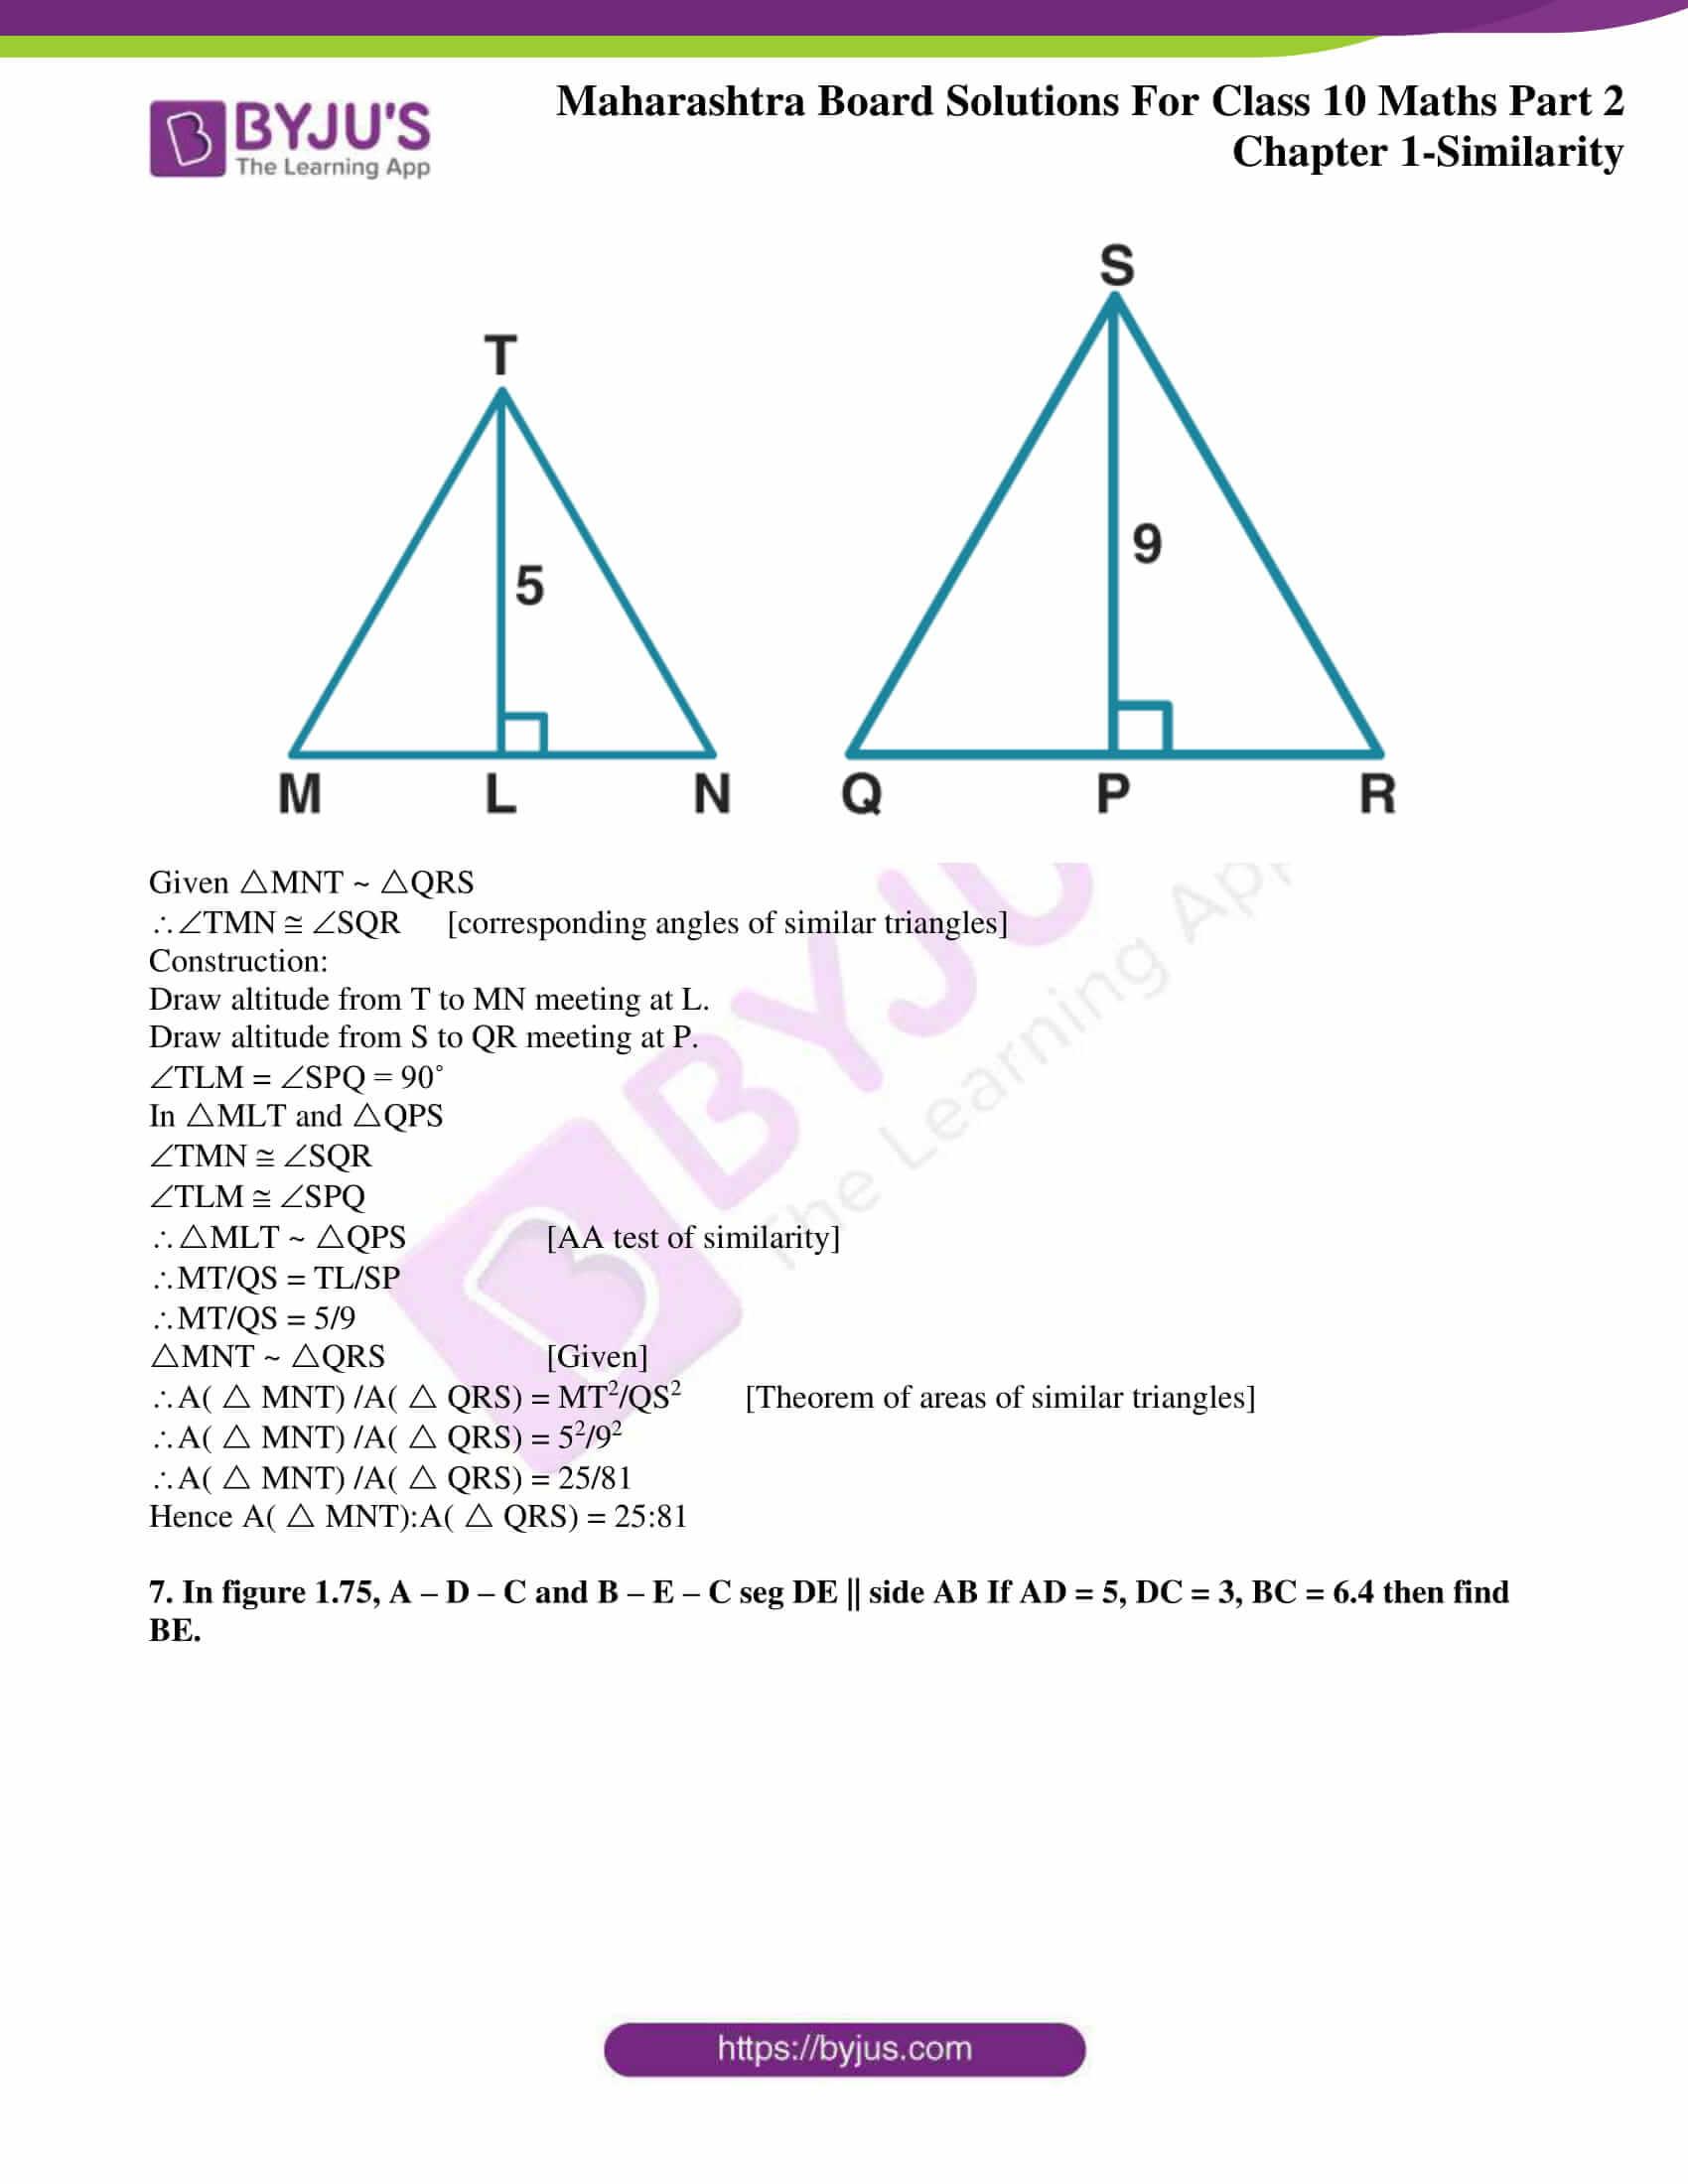 msbshse sol class 10 maths part 2 chapter 1 24